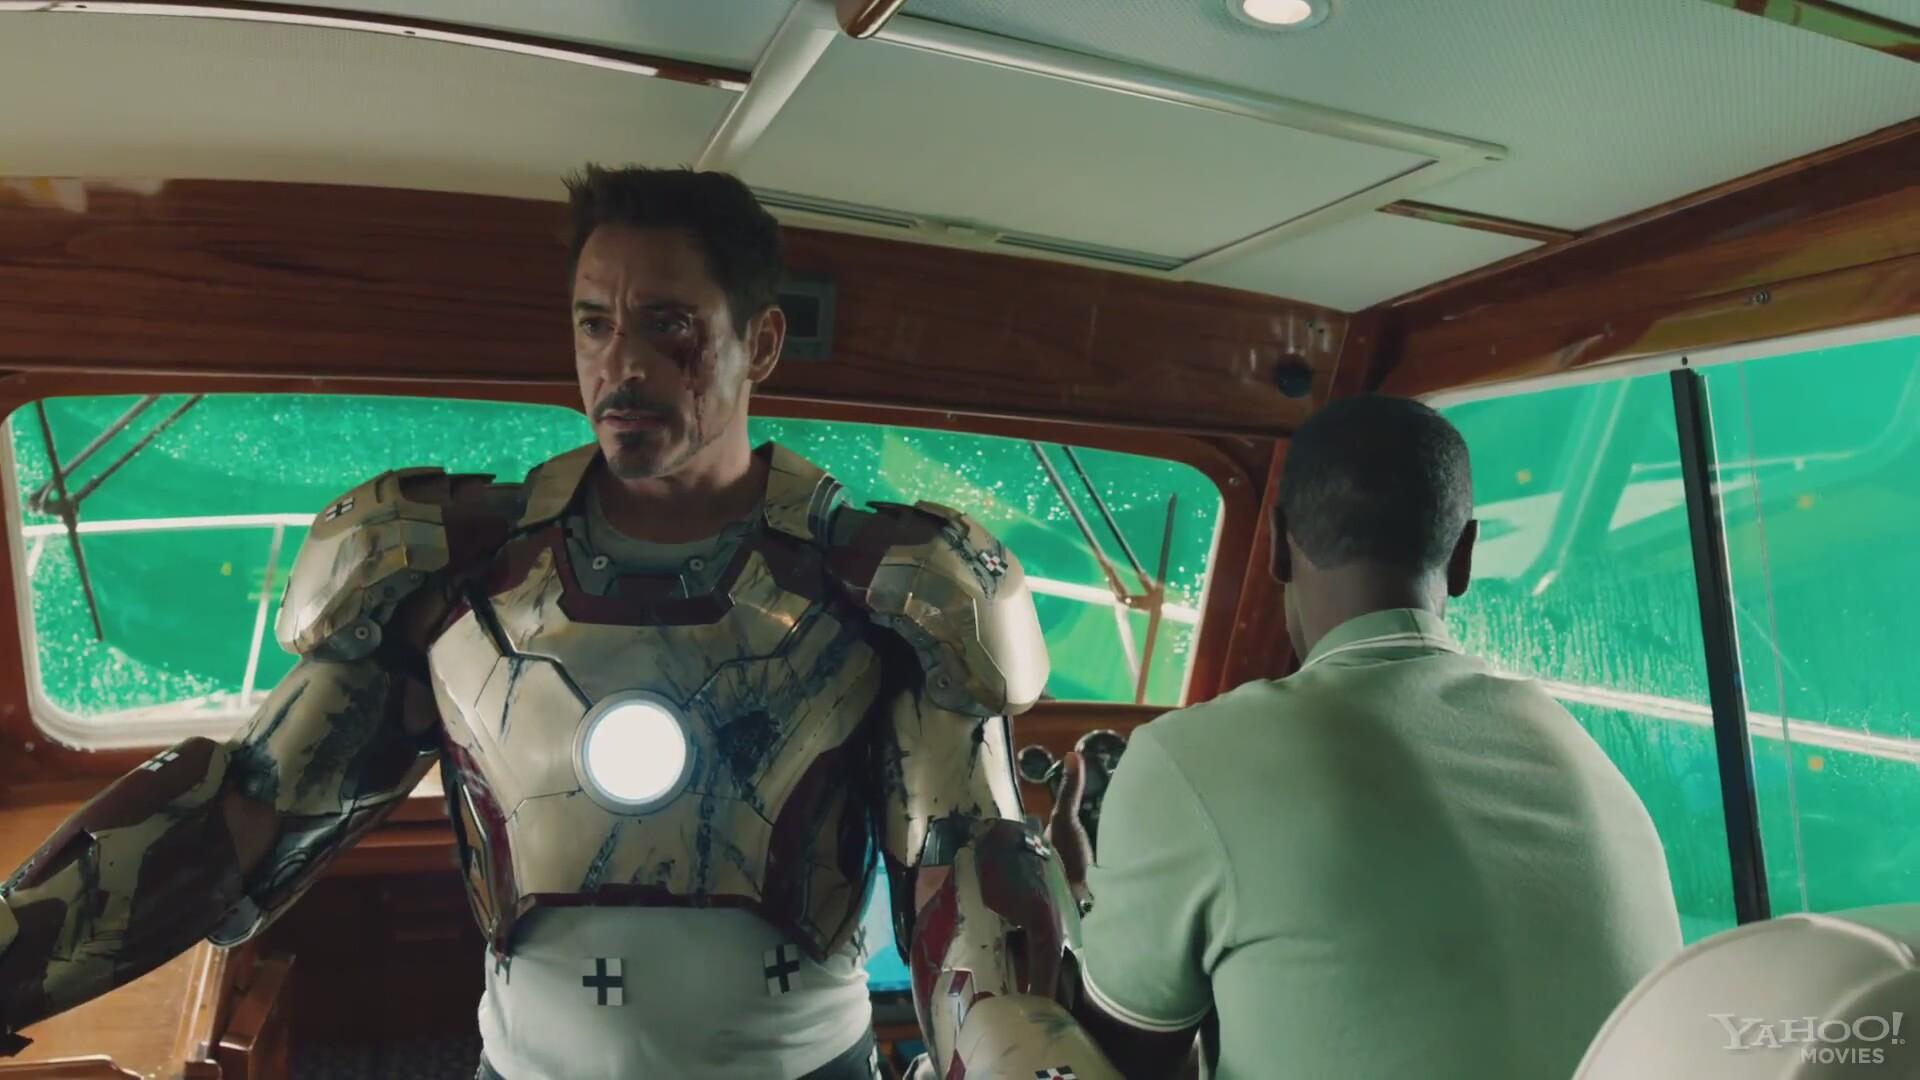 Iron Man 3 Komik Sahneler Izlesenecom